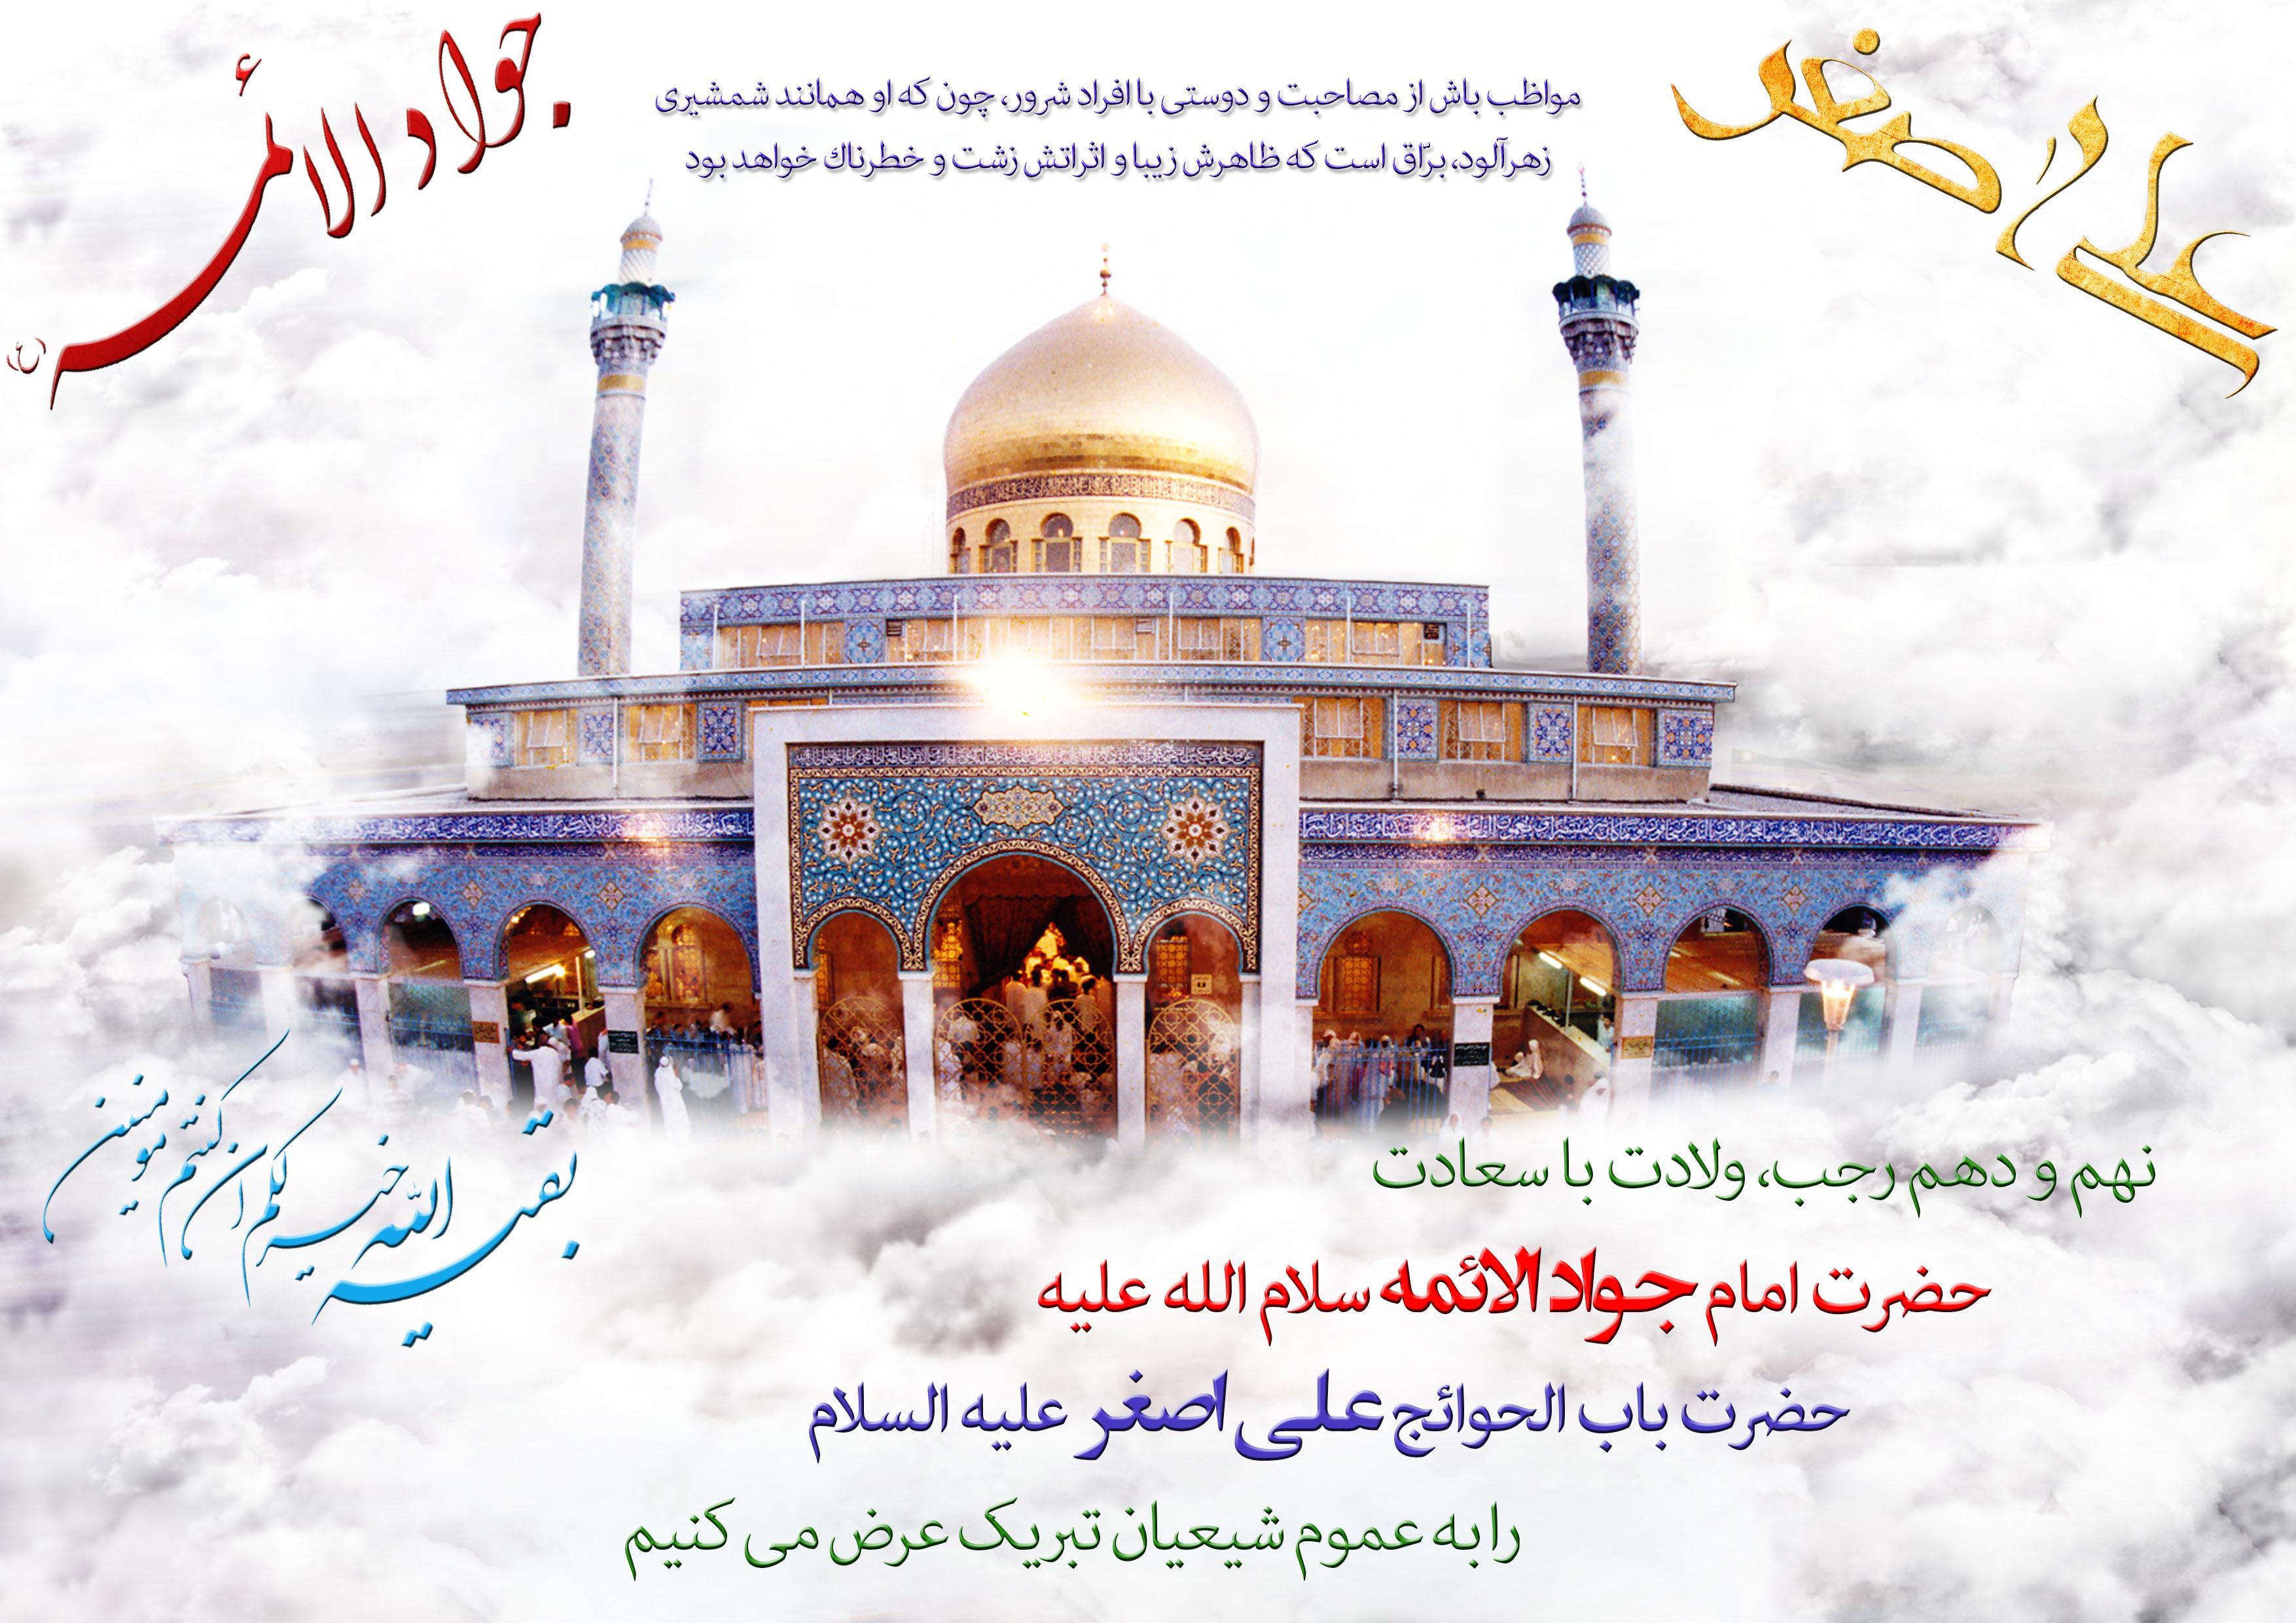 تبریک تولد حضرت علی اصغر (ع) + پیامک های تبریک ولادت